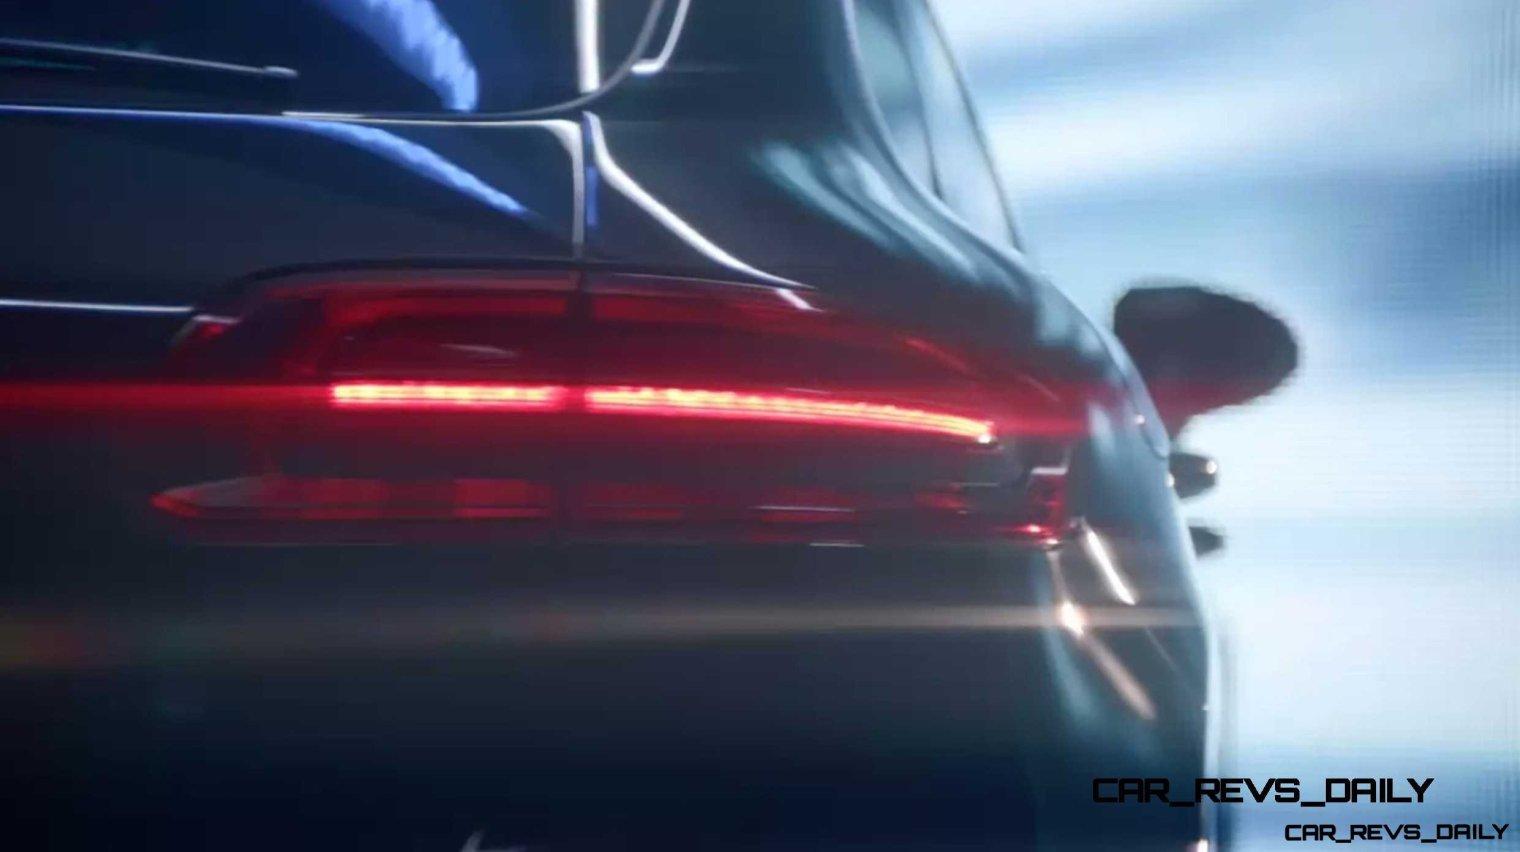 2015 Porsche Macan - Latest Images - CarRevsDaily.com 39